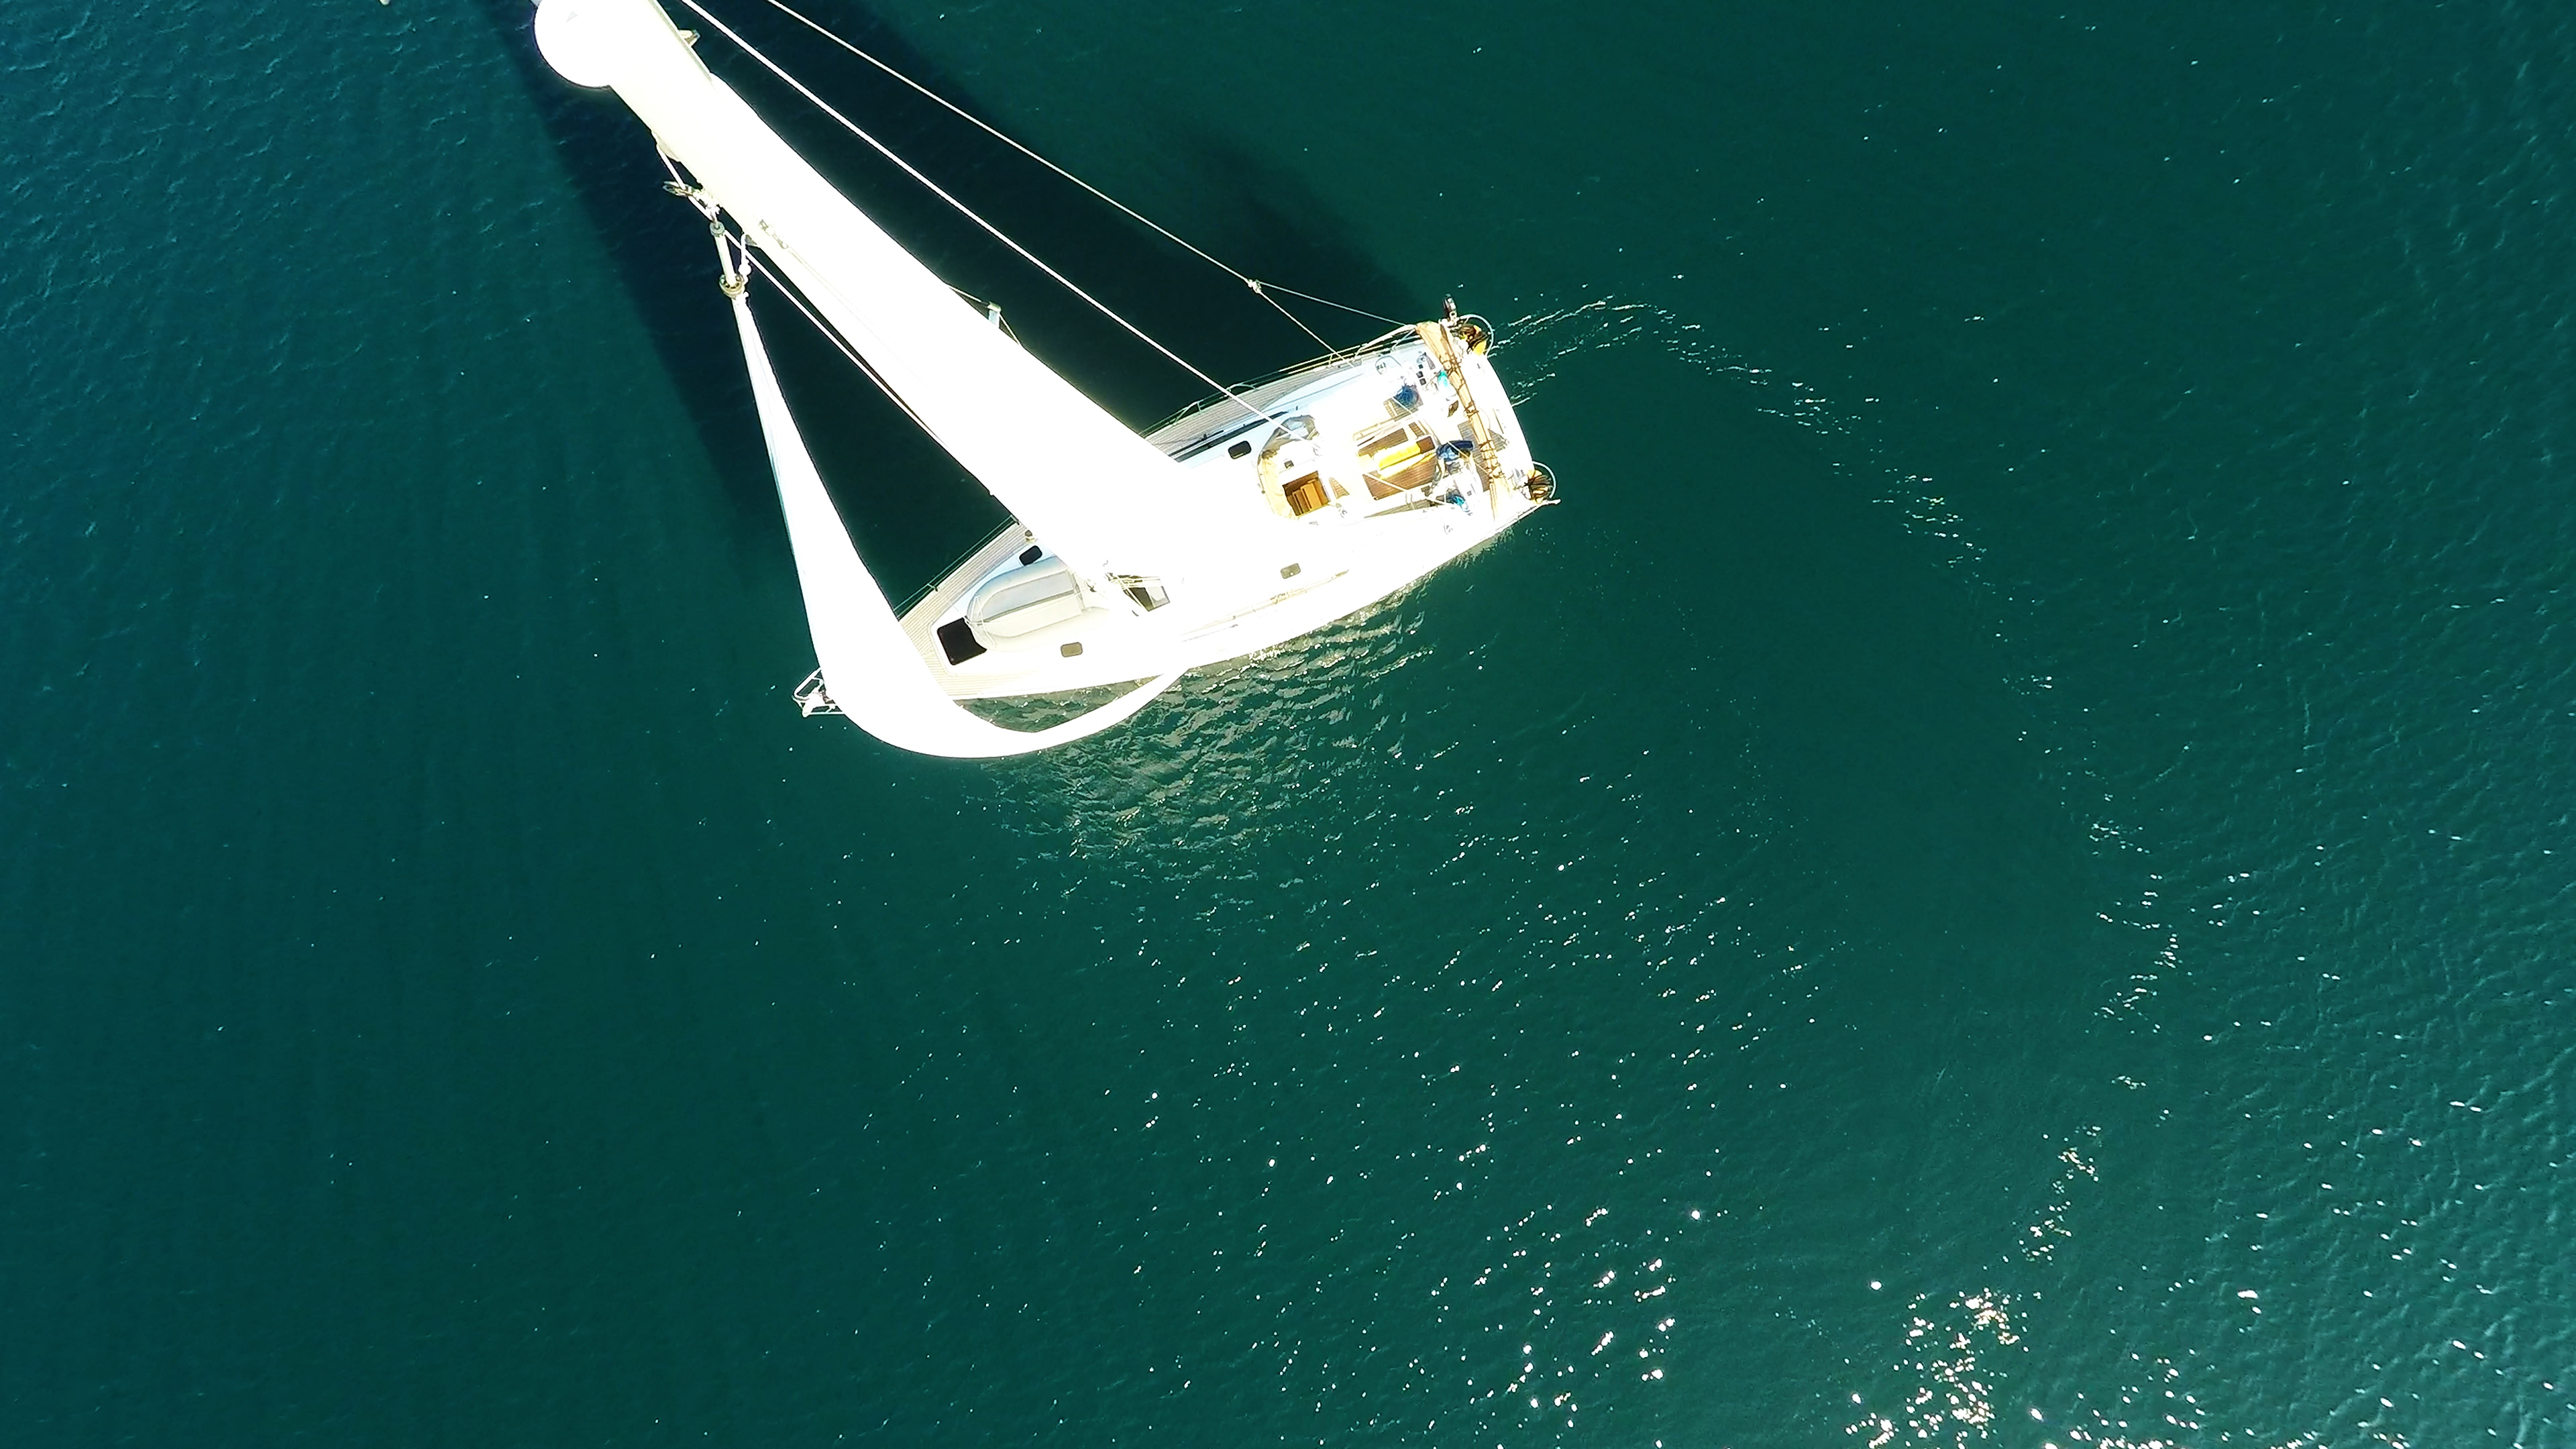 barcha a vela barca a vela dal cielo yacht a vela albero